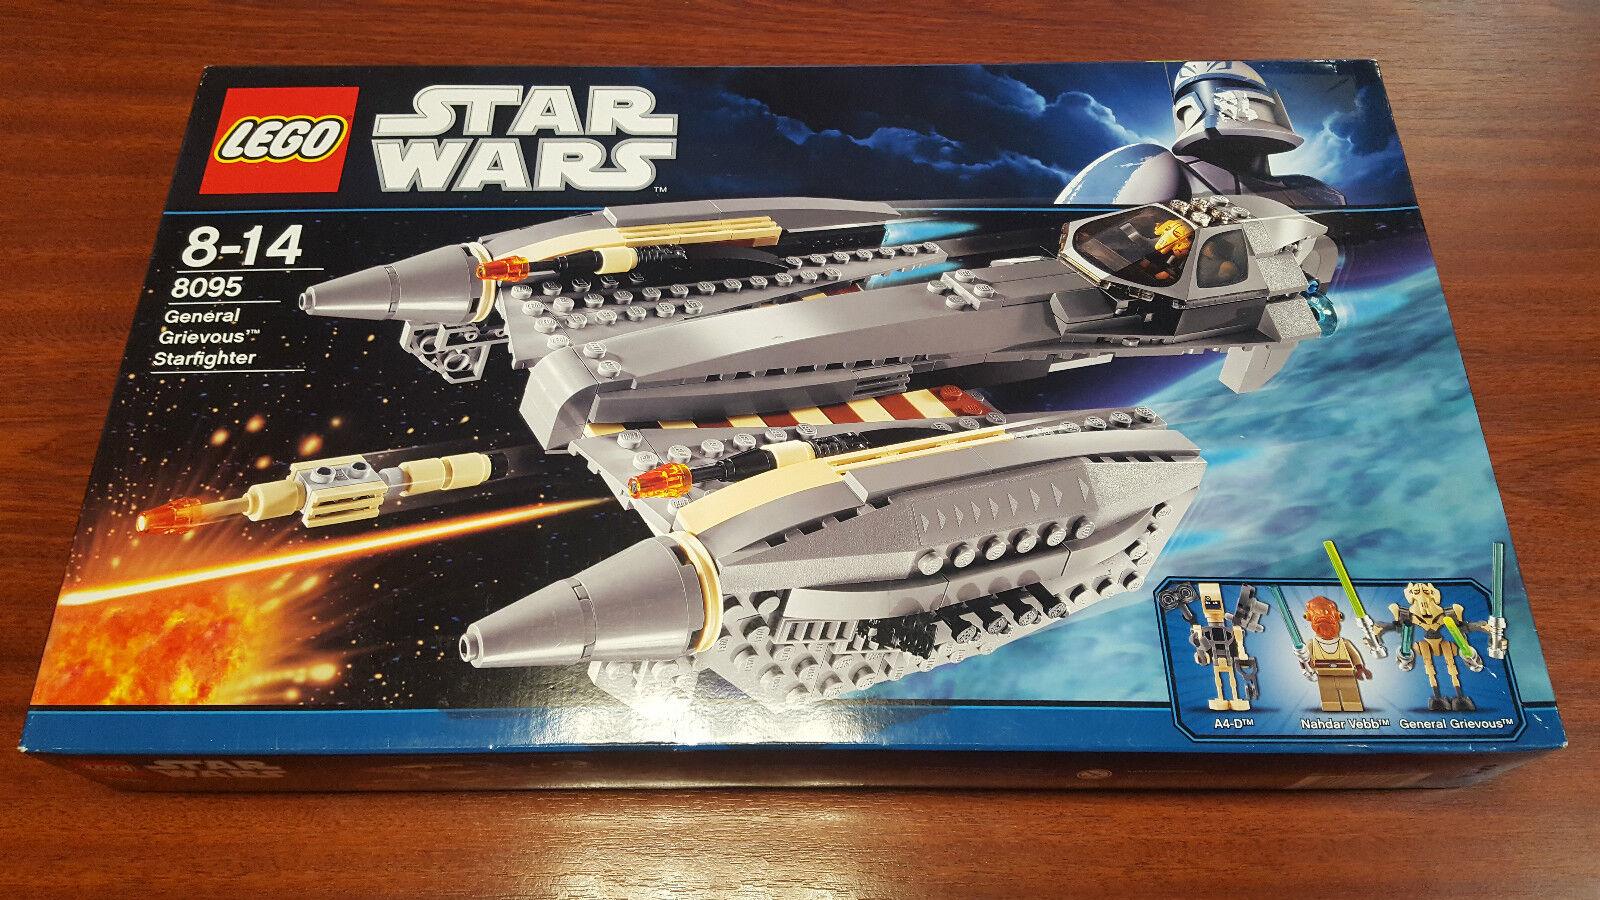 LEGO estrella guerras 8095  General Grievous estrellacombatiente   - nuovo NEUF SUPERBE RARE     punto vendita